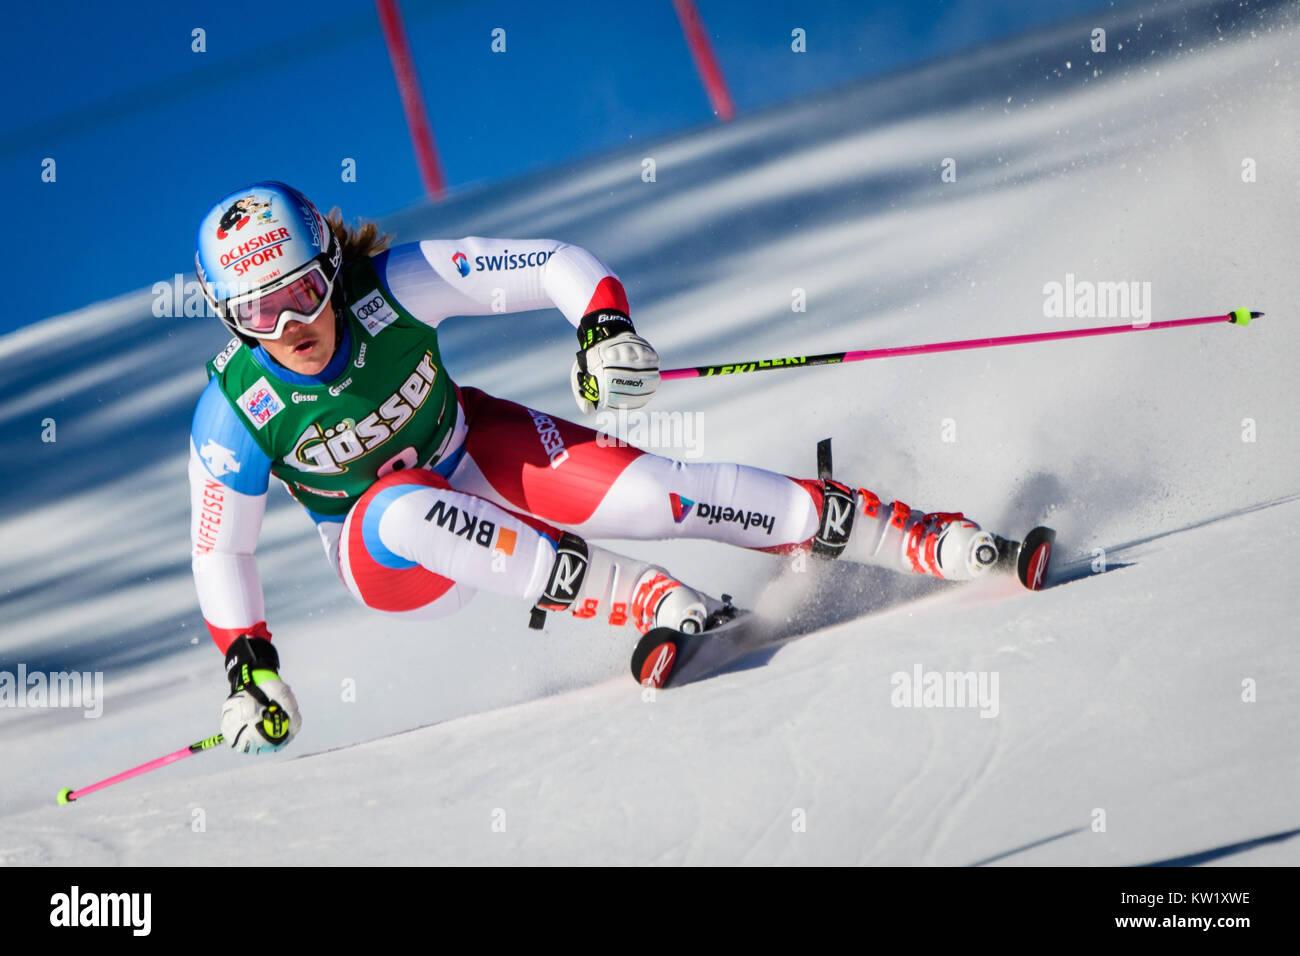 Lienz, Austria. 29th Dec, 2017. Melanie Meillard of Switzerland competes during the FIS World Cup Ladies Giant Slalom - Stock Image